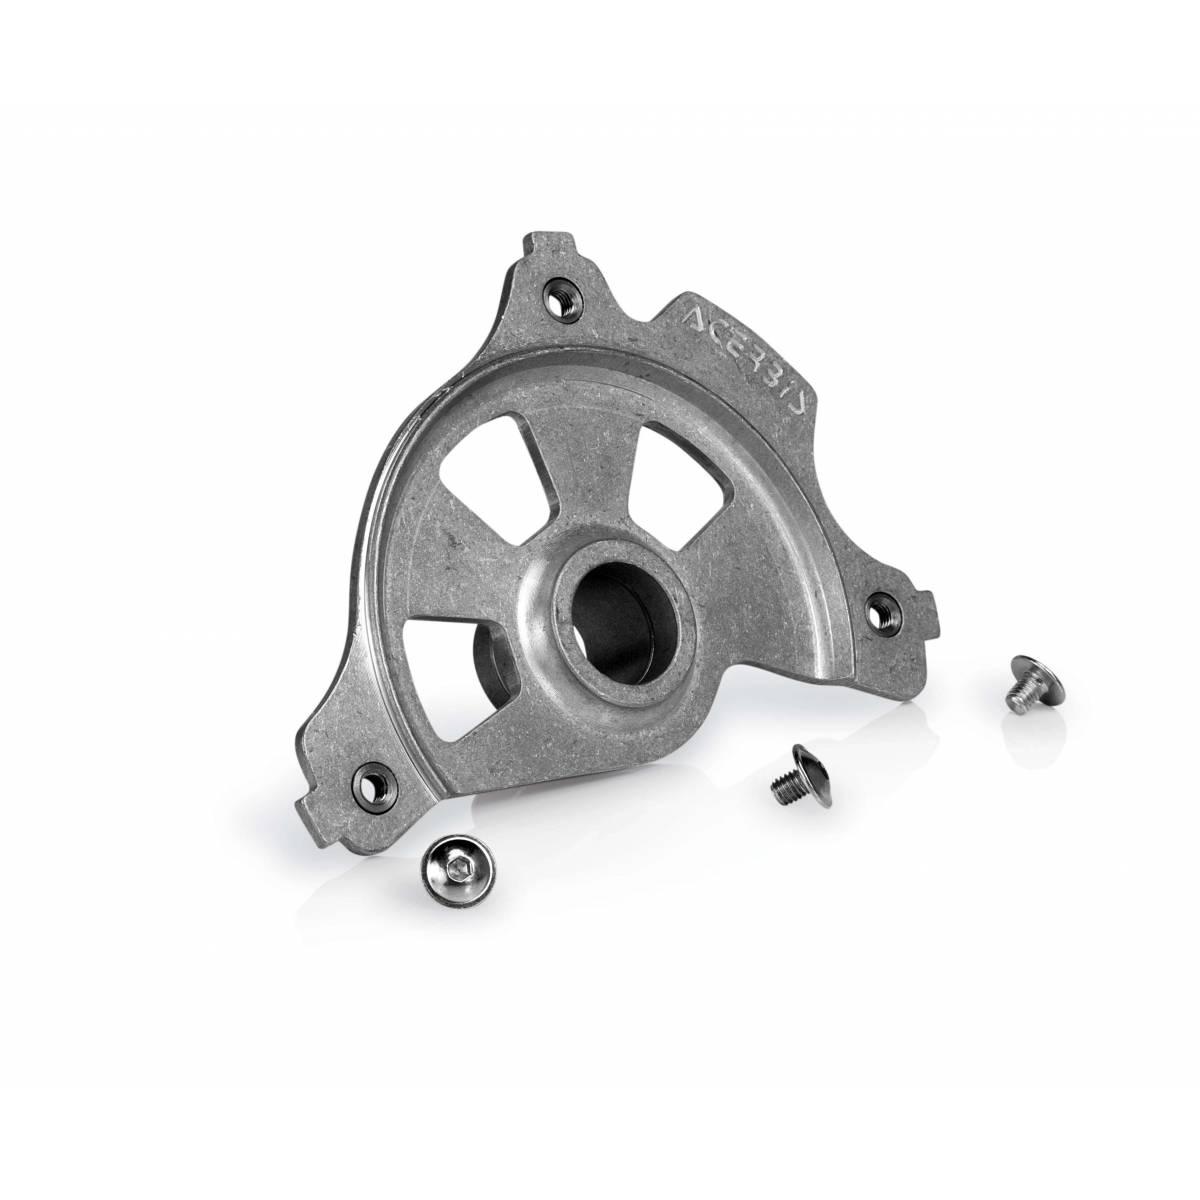 0017566 - Kit Acople Cubredisco Delantero Acerbis Yz